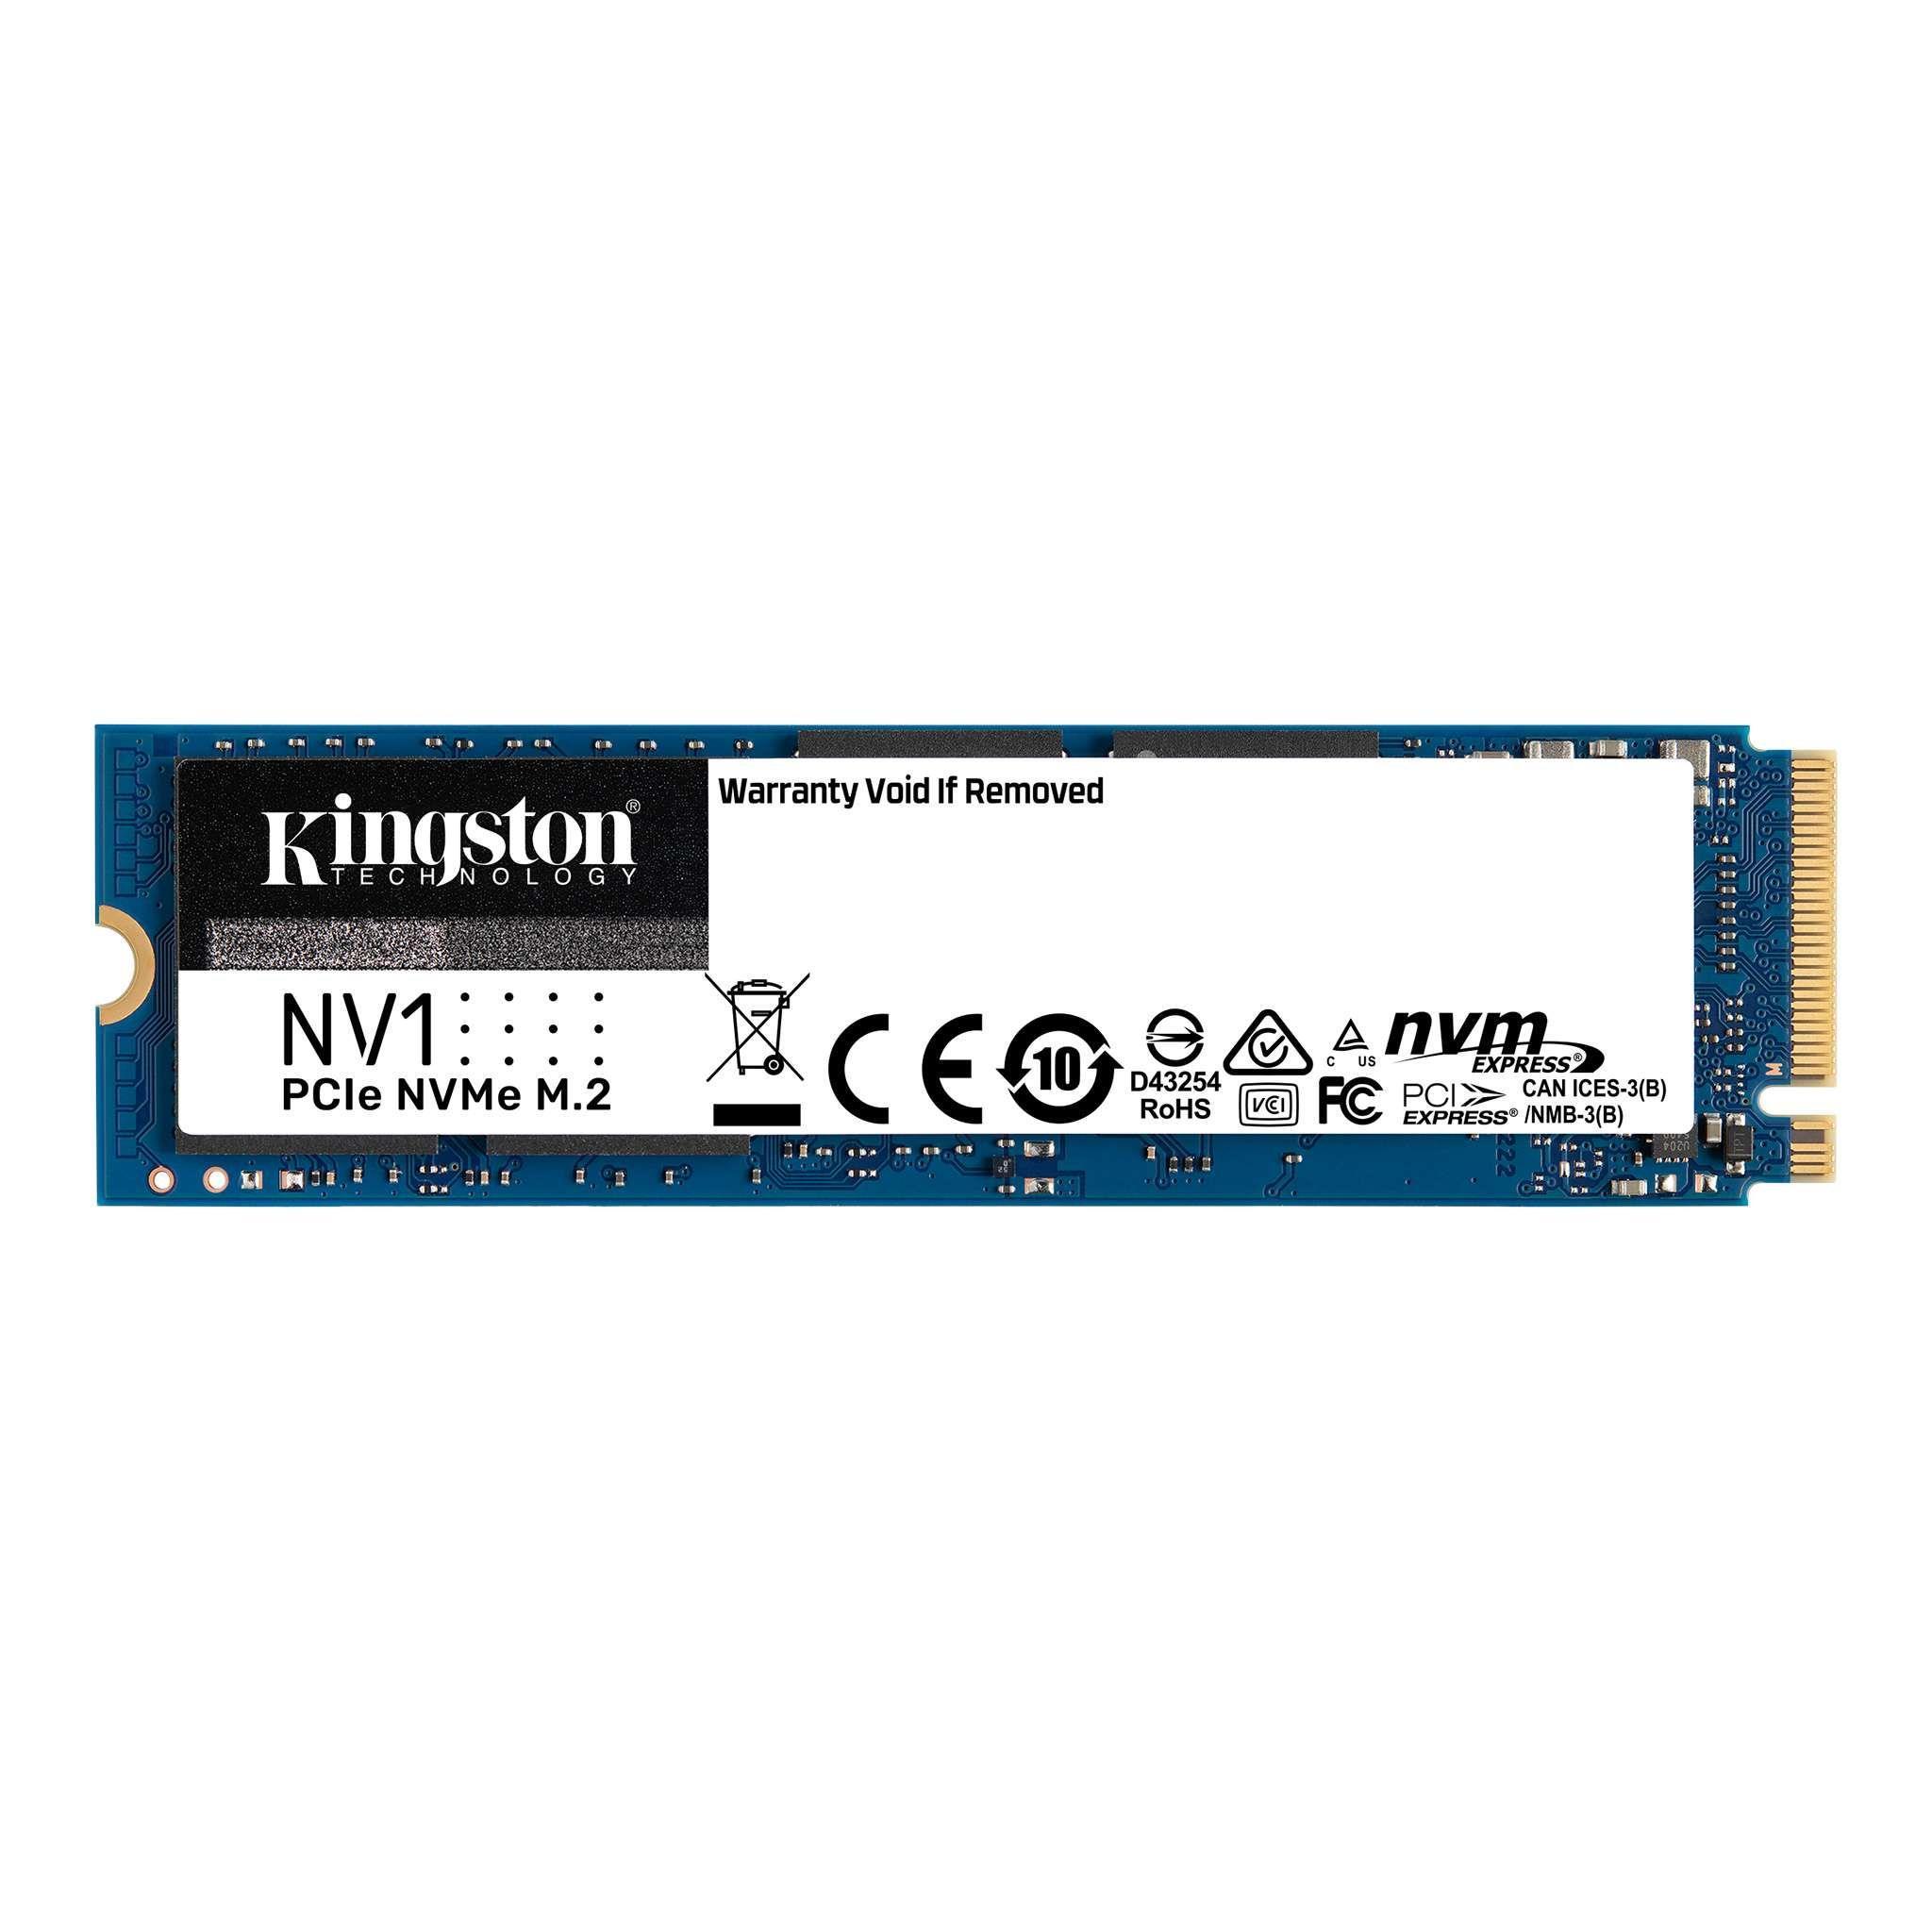 Dysk SSD Kingston NV1 2000GB M.2 NVMe PCIe Gen 3.0 x4 (2100 1700 MB s) 2280